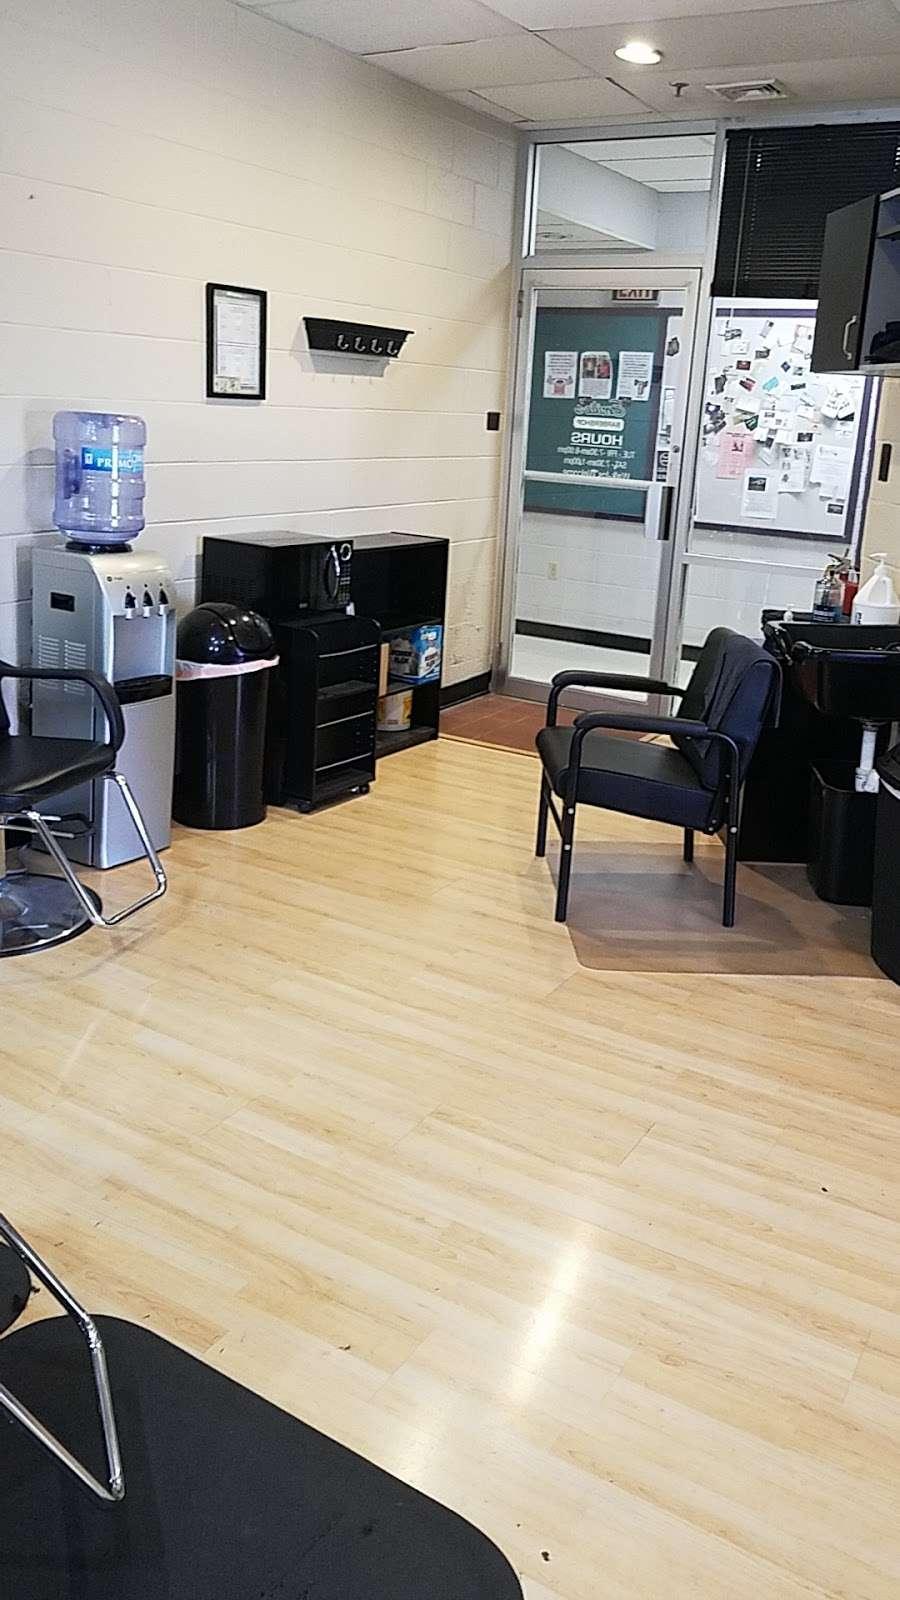 Emilios Barber Shop - hair care  | Photo 2 of 4 | Address: 2880 Carol Rd, East York, PA 17402, USA | Phone: (717) 968-8239